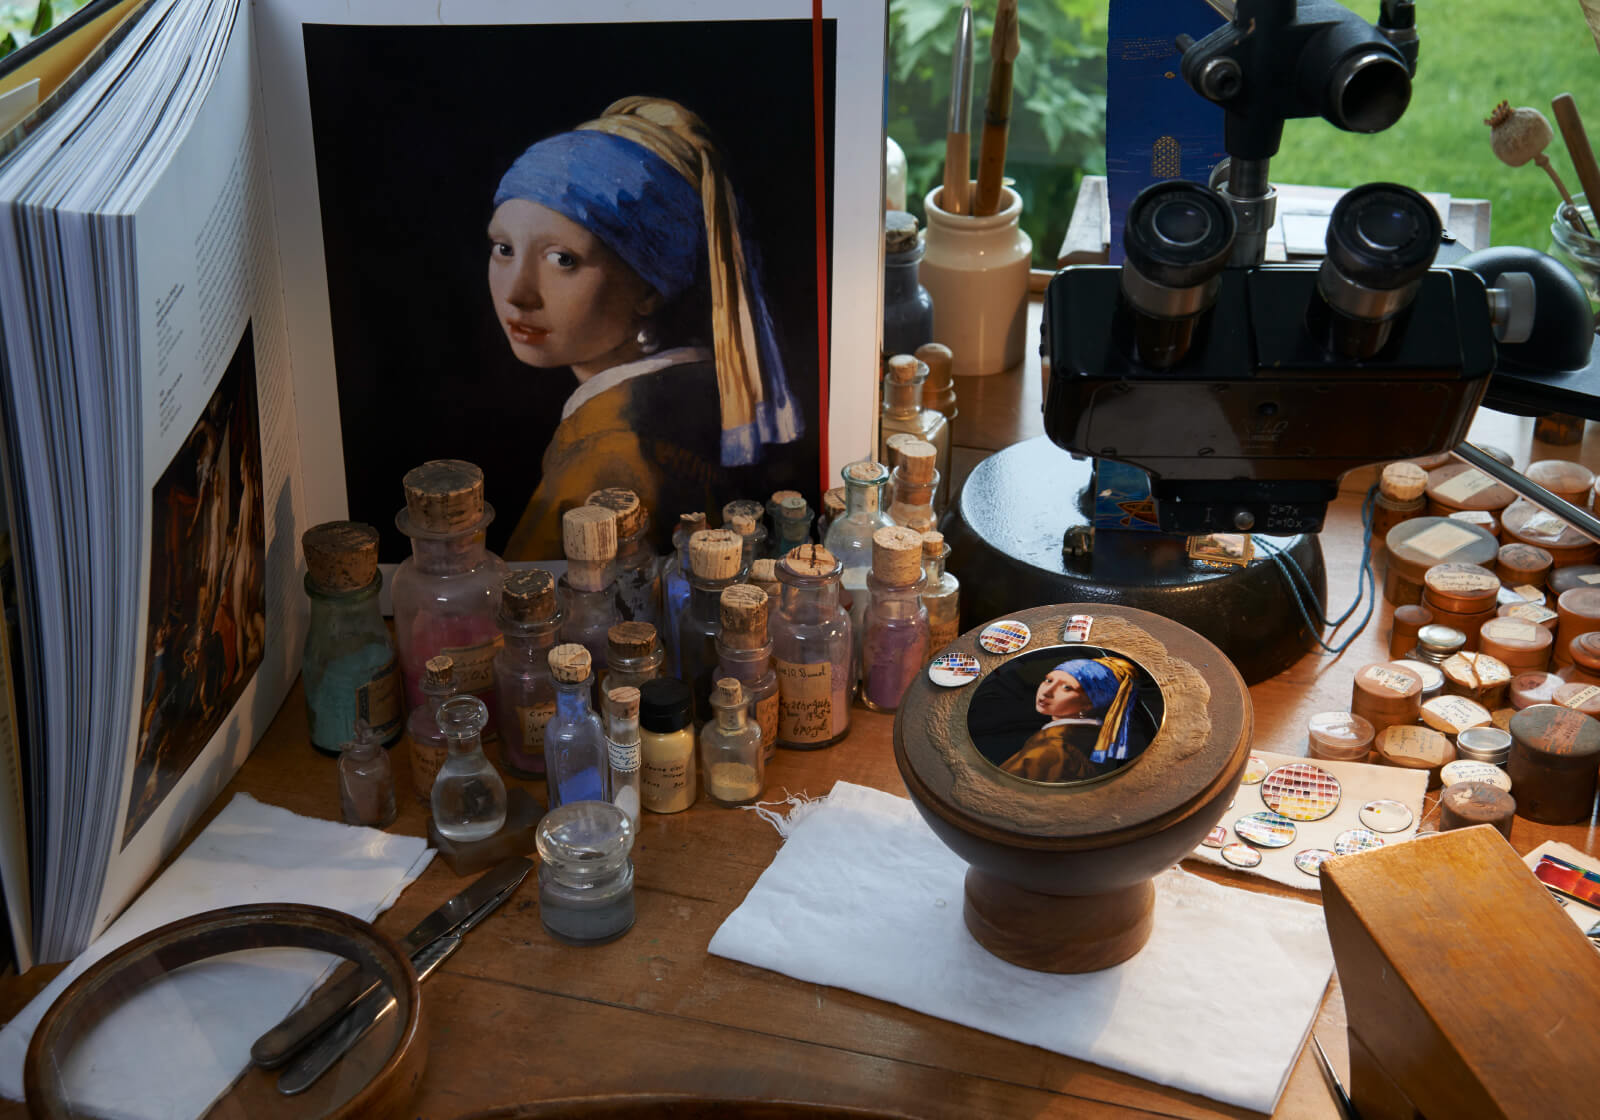 Vacheron Constantin - Les Cabinotiers Sonnerie Westminster – Homenagem a Johannes Vermeer | © Vacheron Constantin